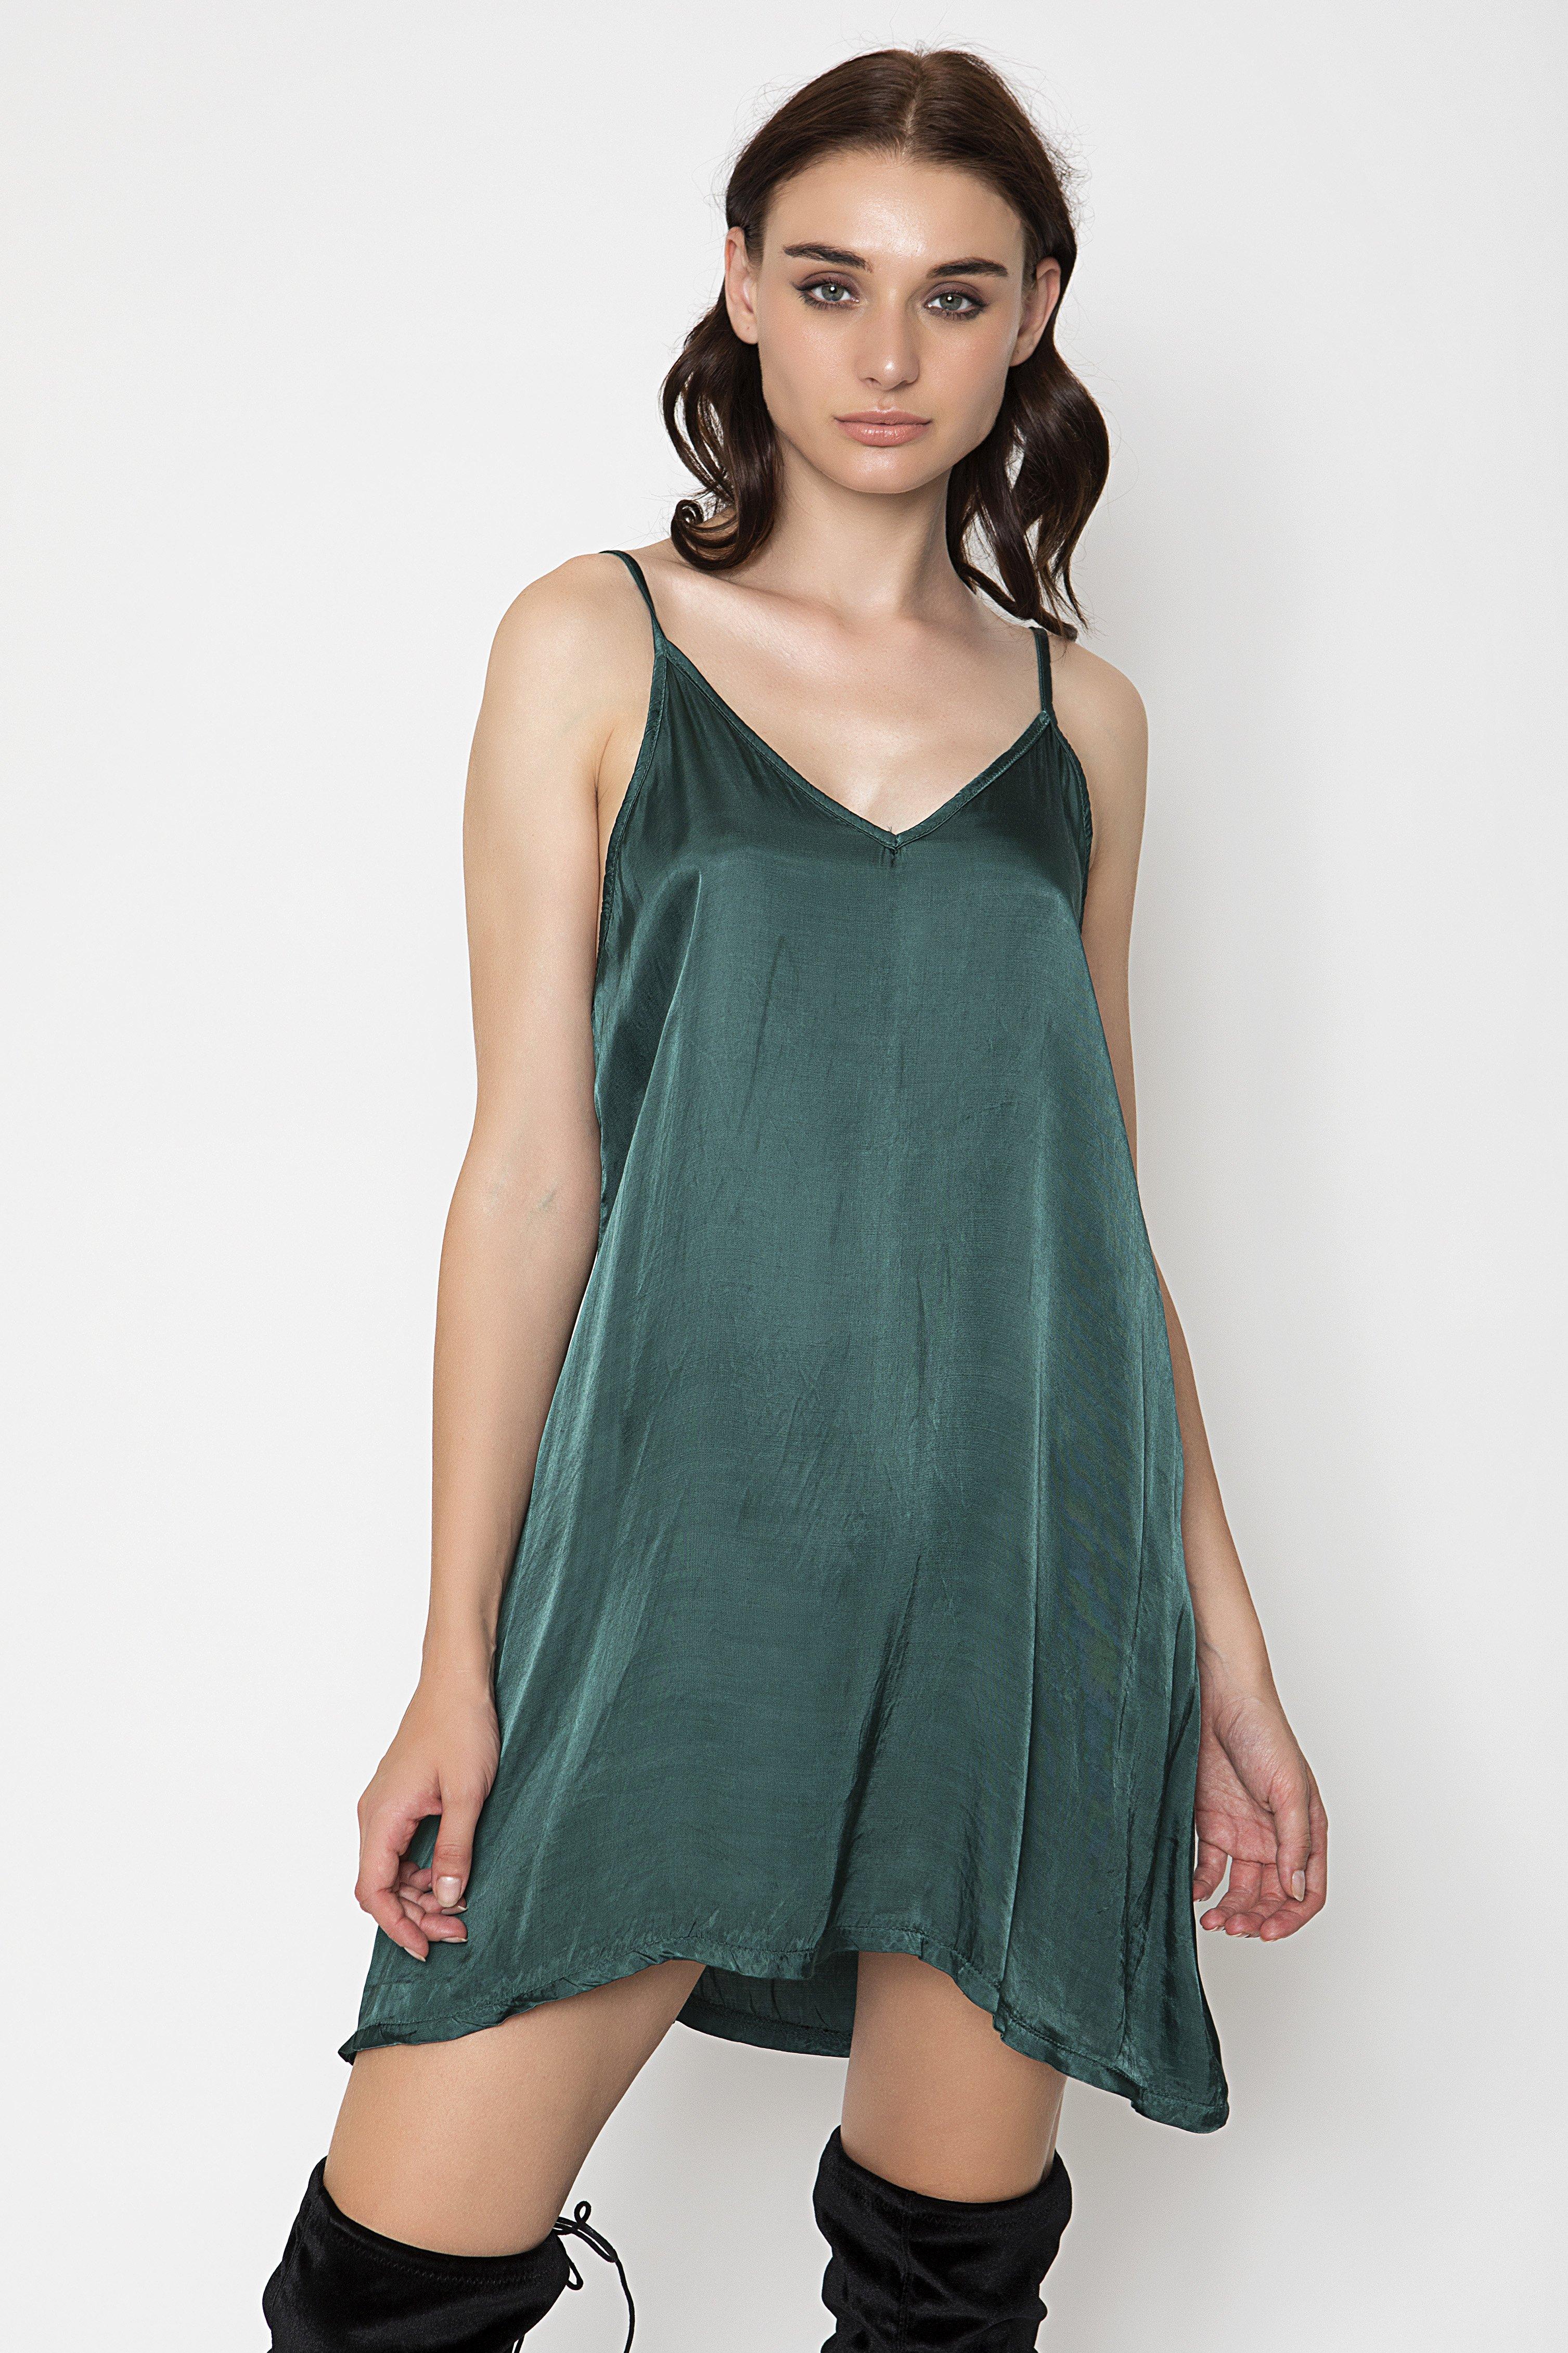 SATIN SLIP ΦΟΡΕΜΑ - Πράσινο clothes   φορέματα   φόρμες   mini φορέματα